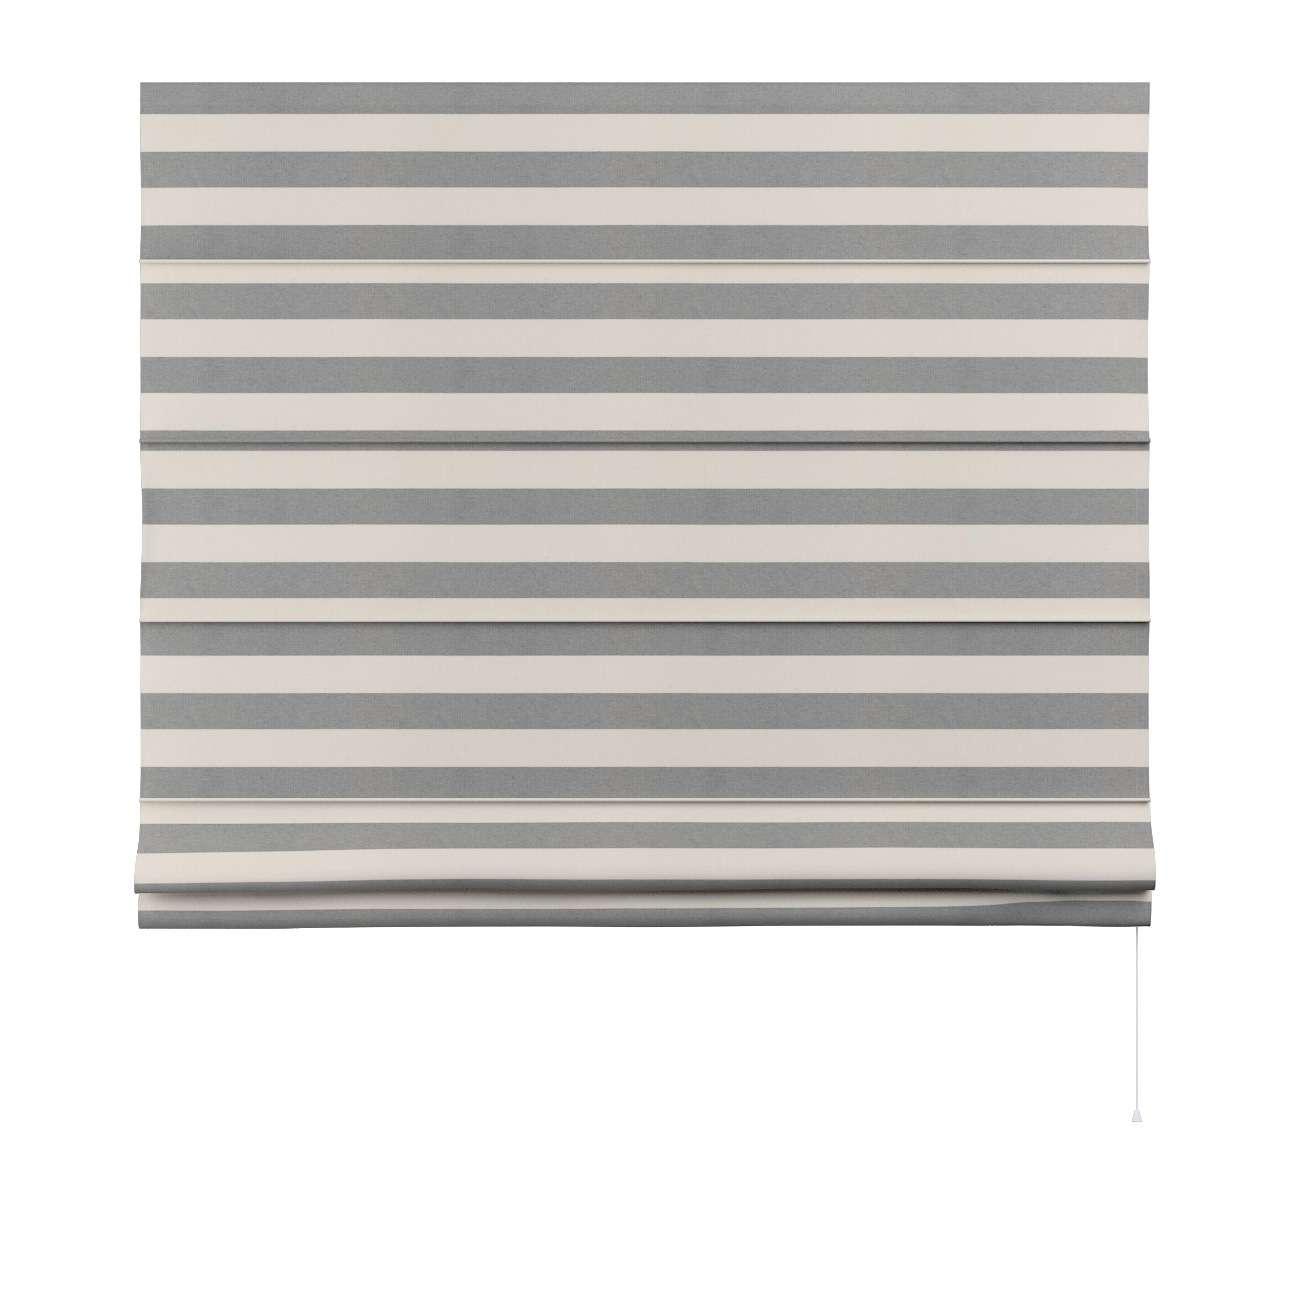 Rímska roleta Capri V kolekcii Quadro, tkanina: 142-71